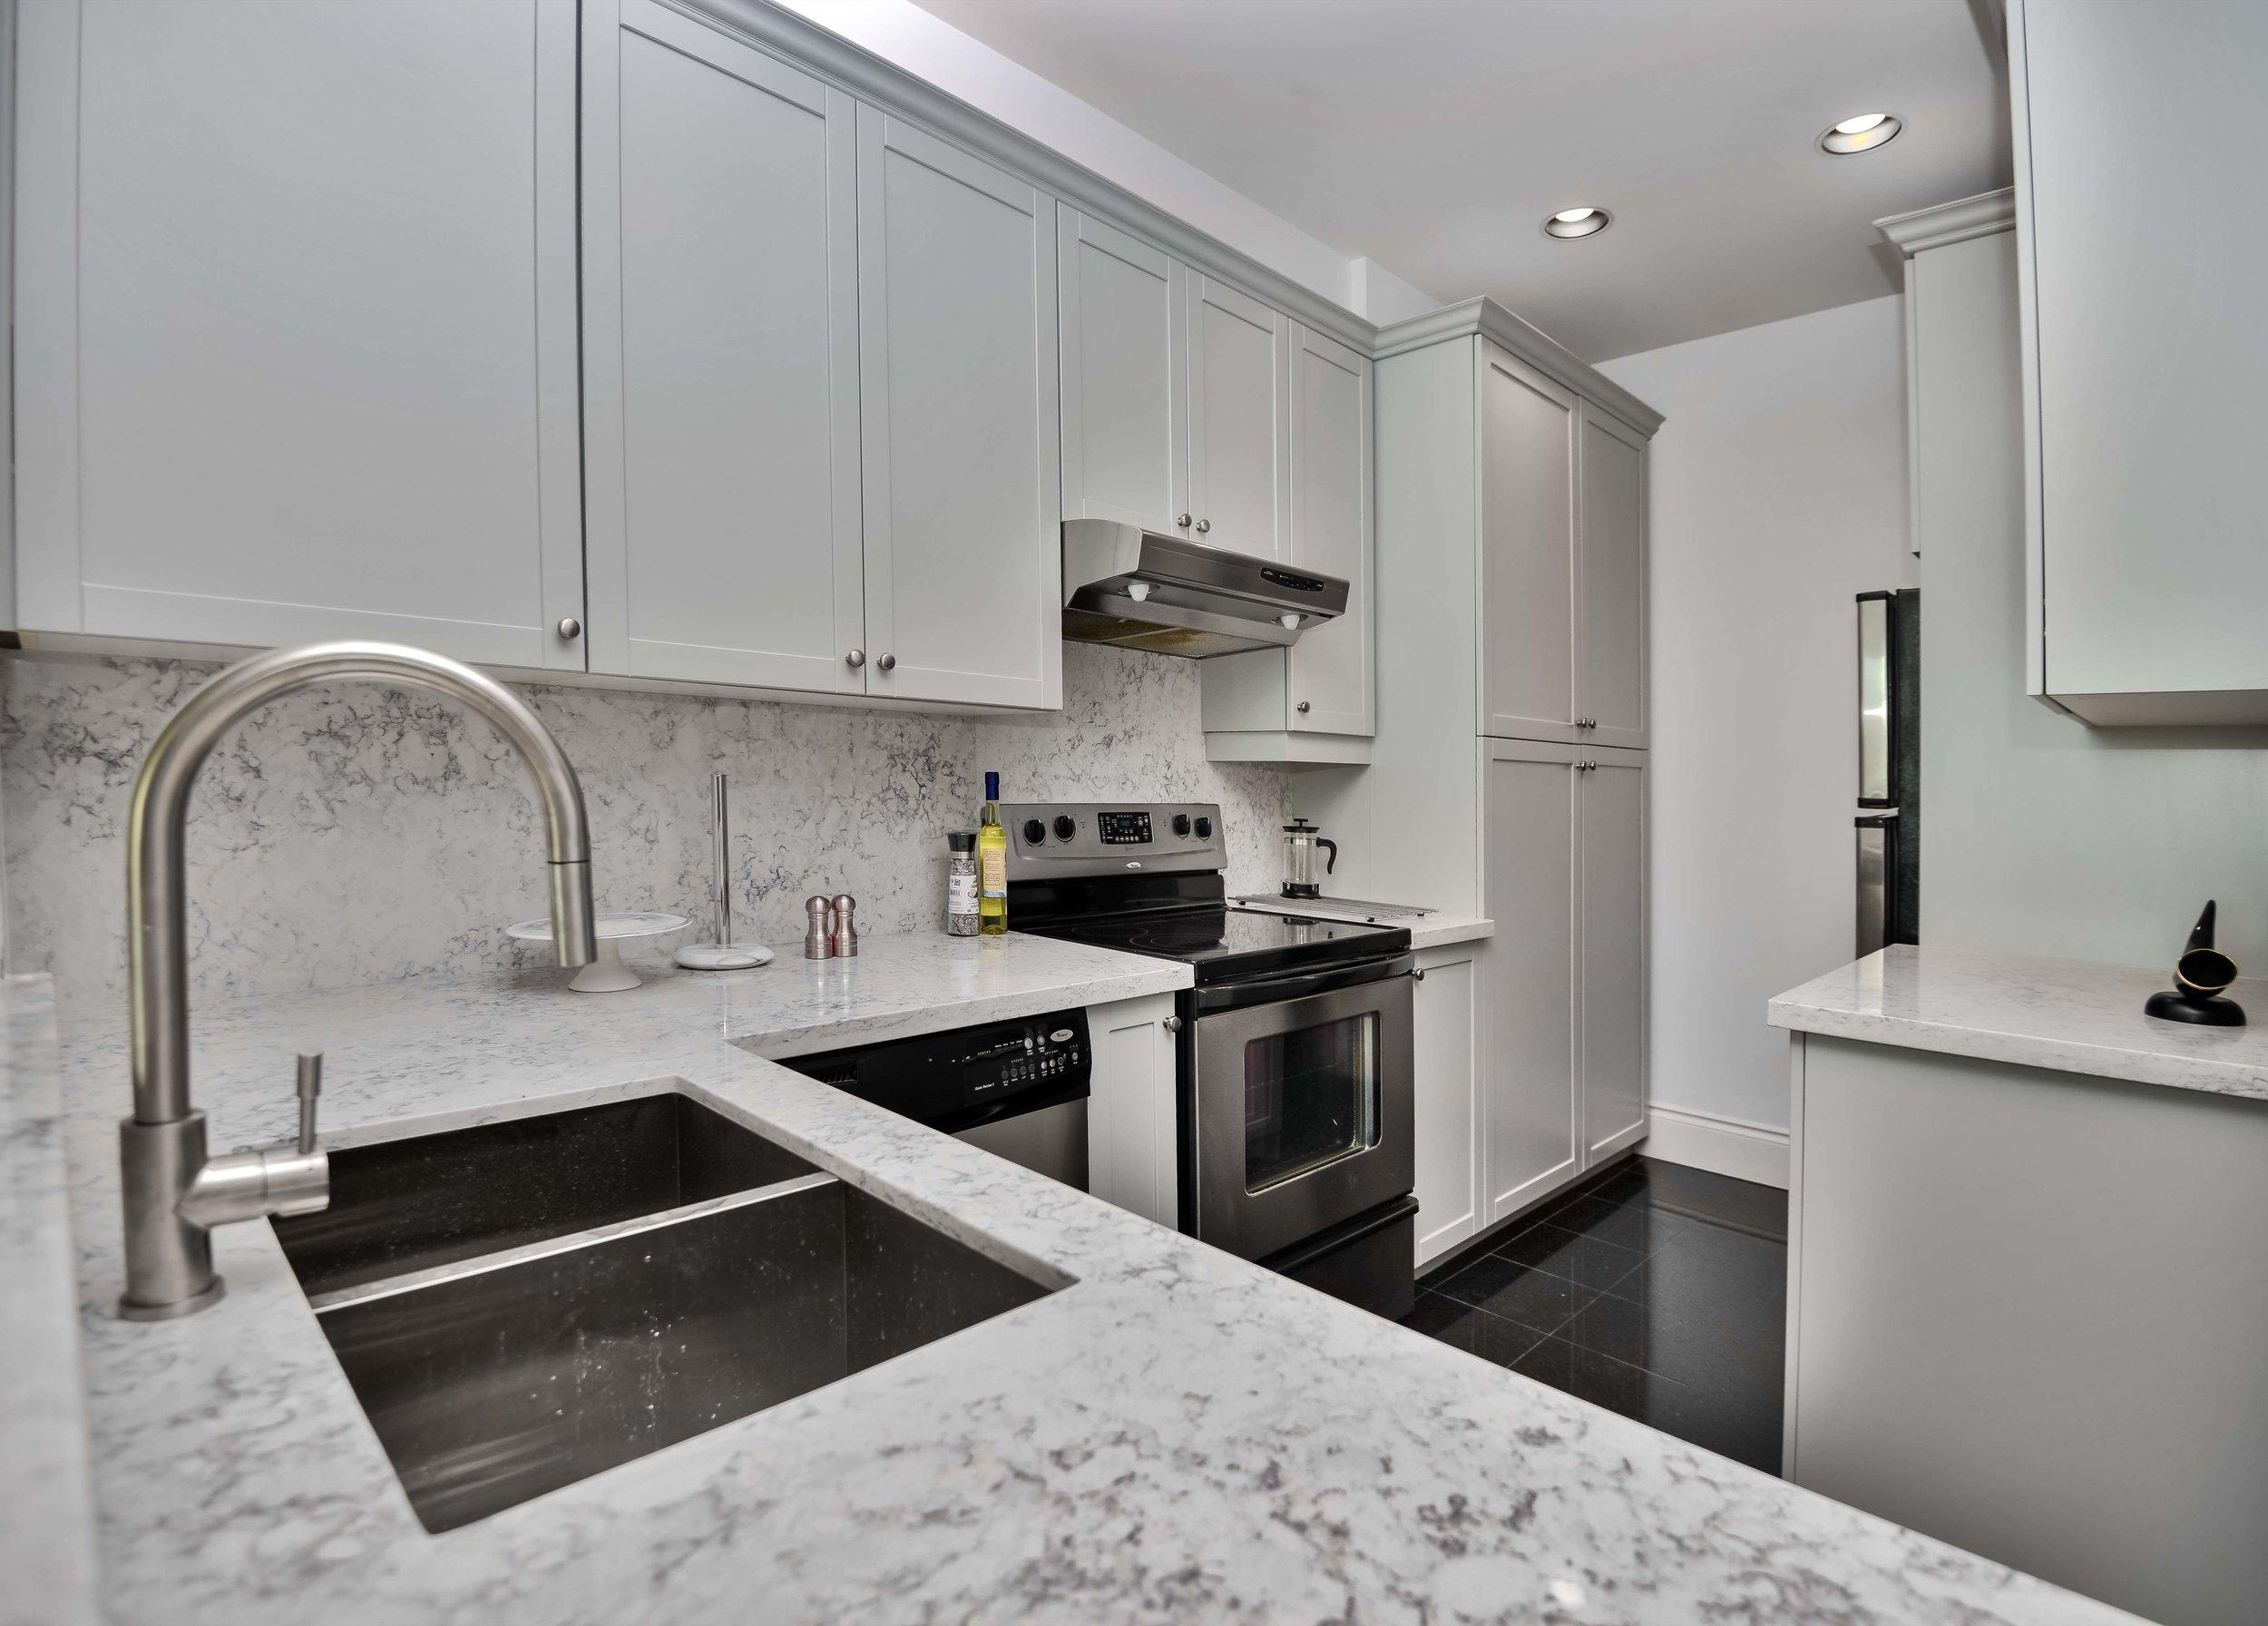 Photo tips Furnished Apartments Toronto kitchen